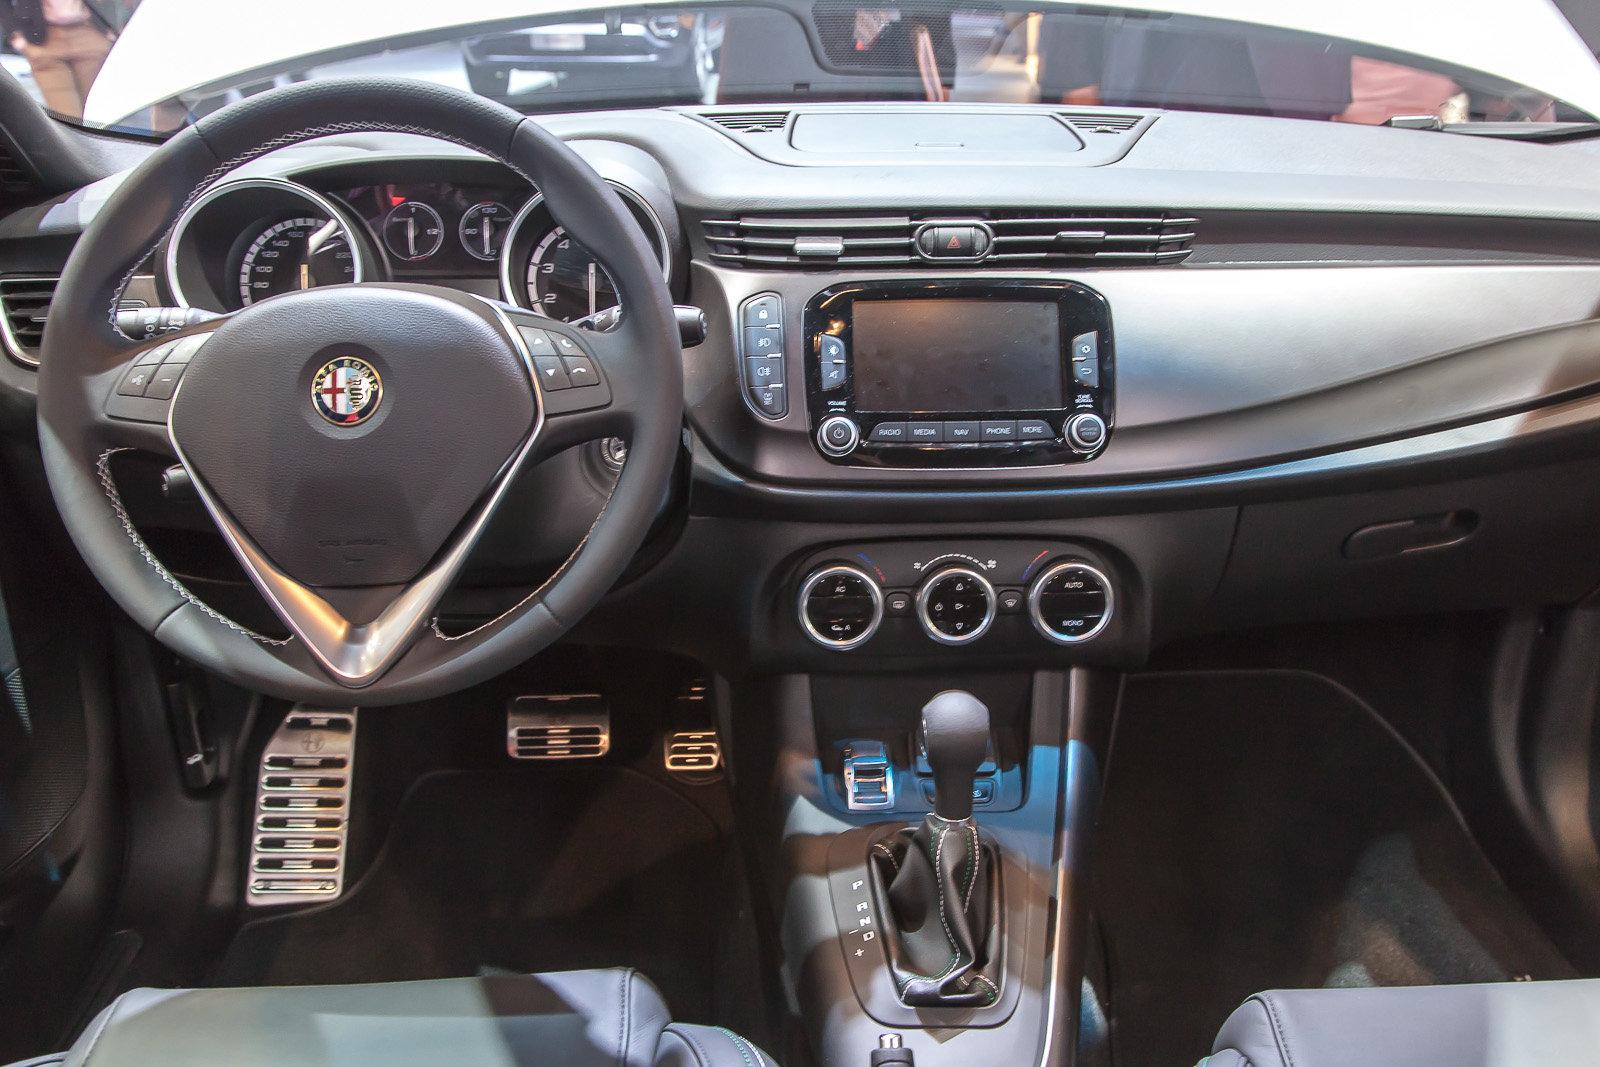 Alfa Romeo Giulietta Sport 2018 >> Foto - I nuovi interni dell'Alfa Romeo Giulietta